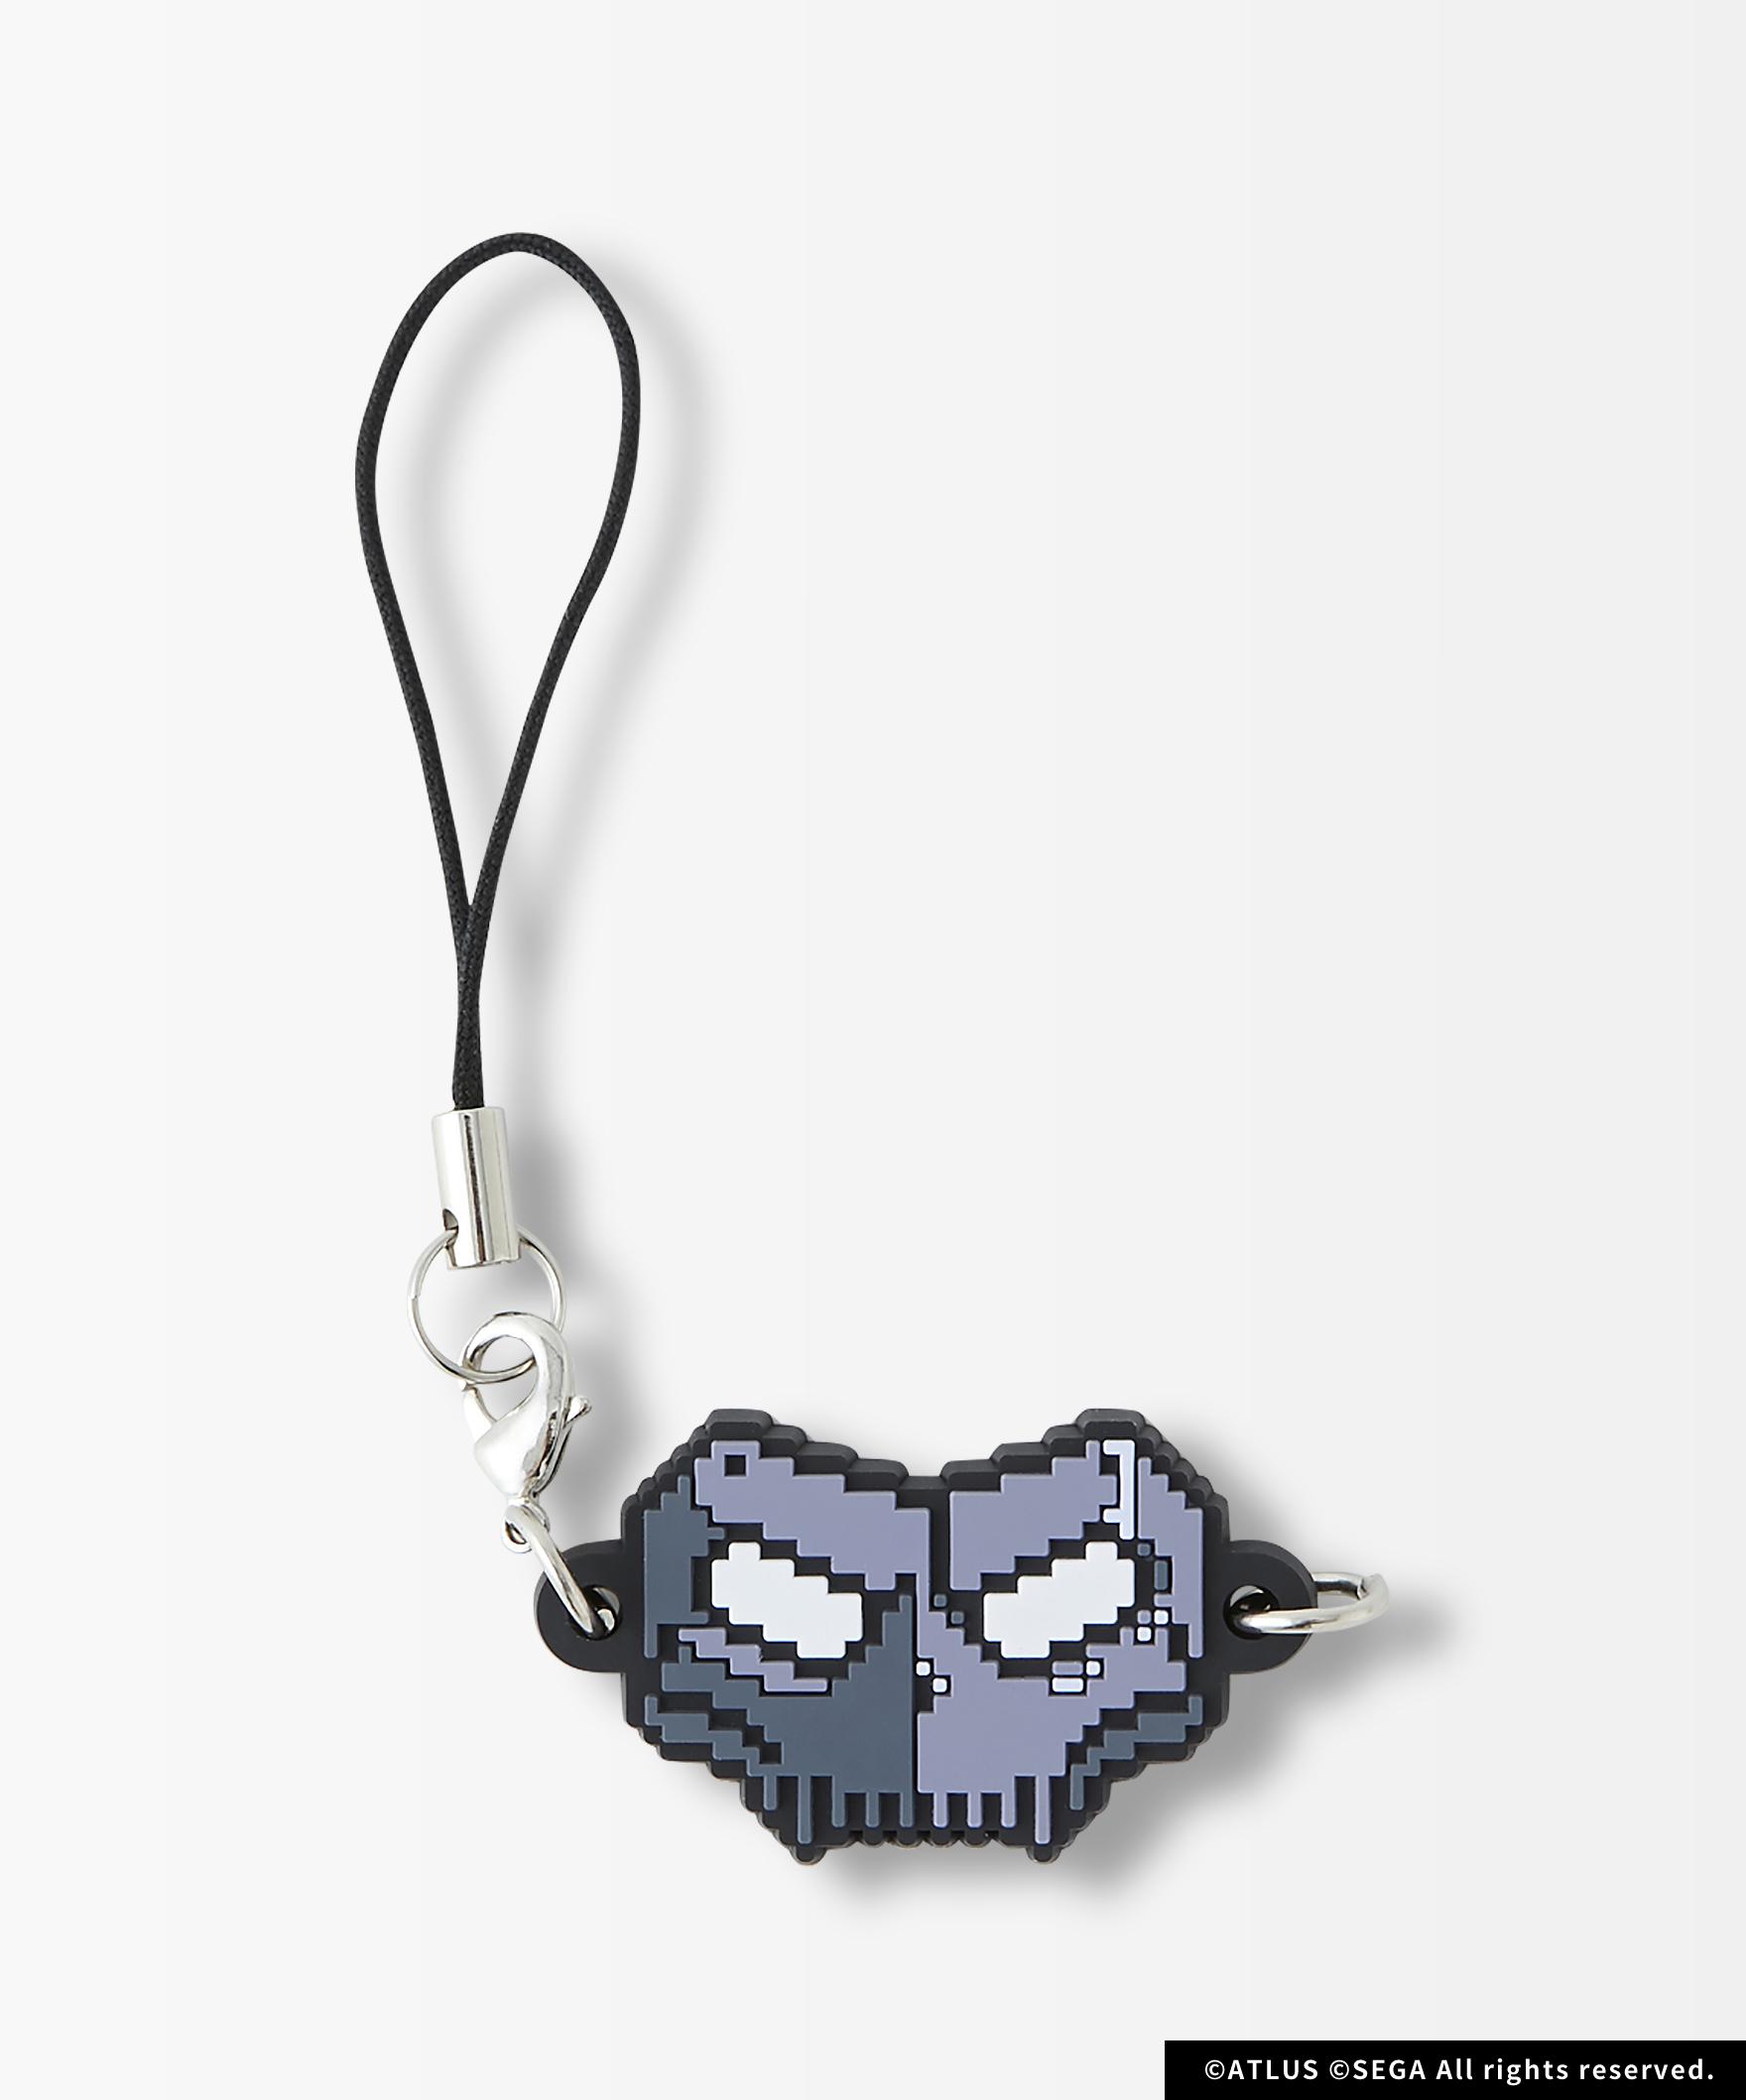 P5R Pixel Mask Ruber Strap